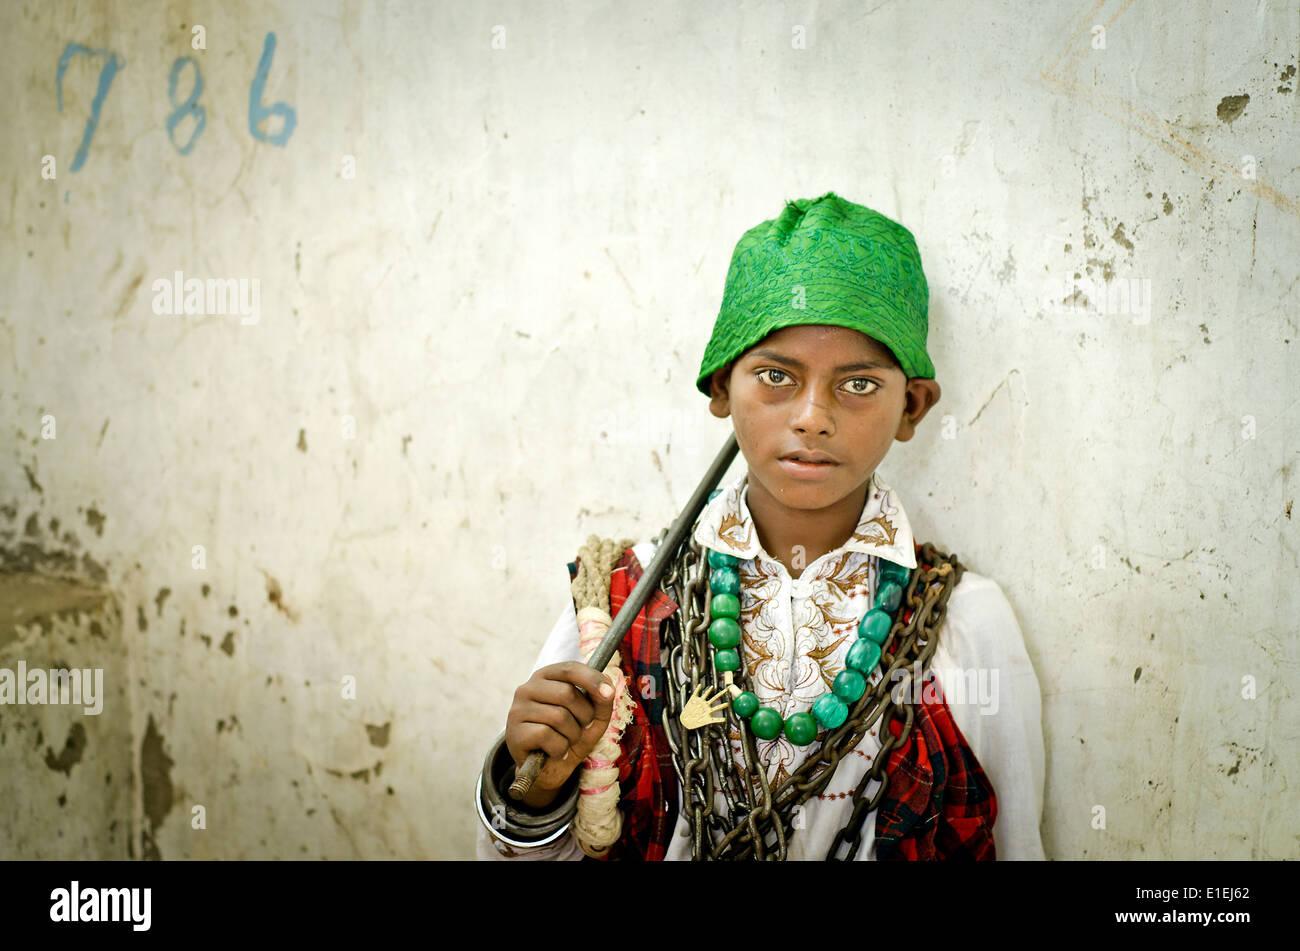 Fakir soufi(saint homme musulman) Ajmer, Inde Photo Stock